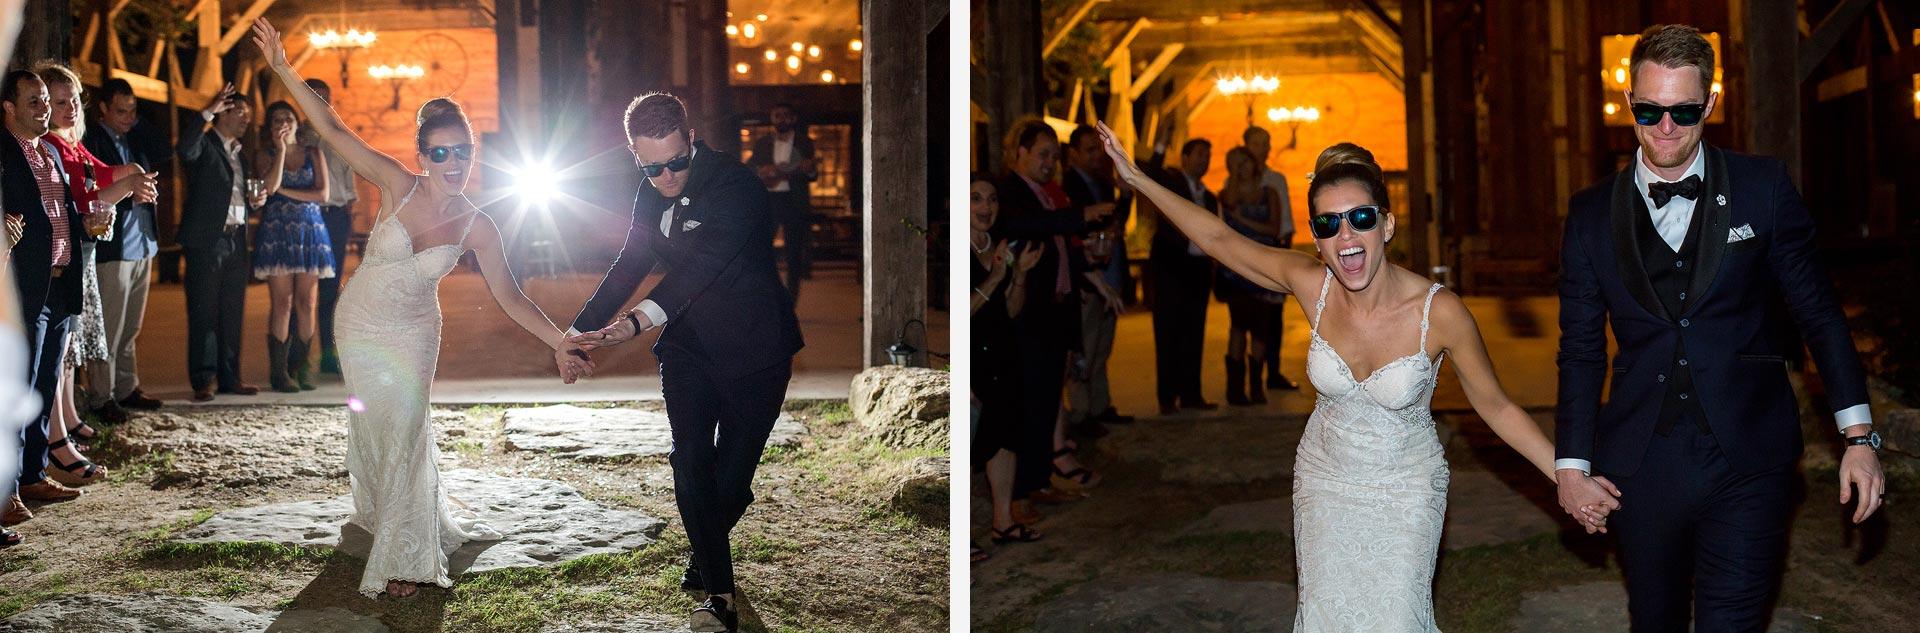 Best Wedding at CreekHaus